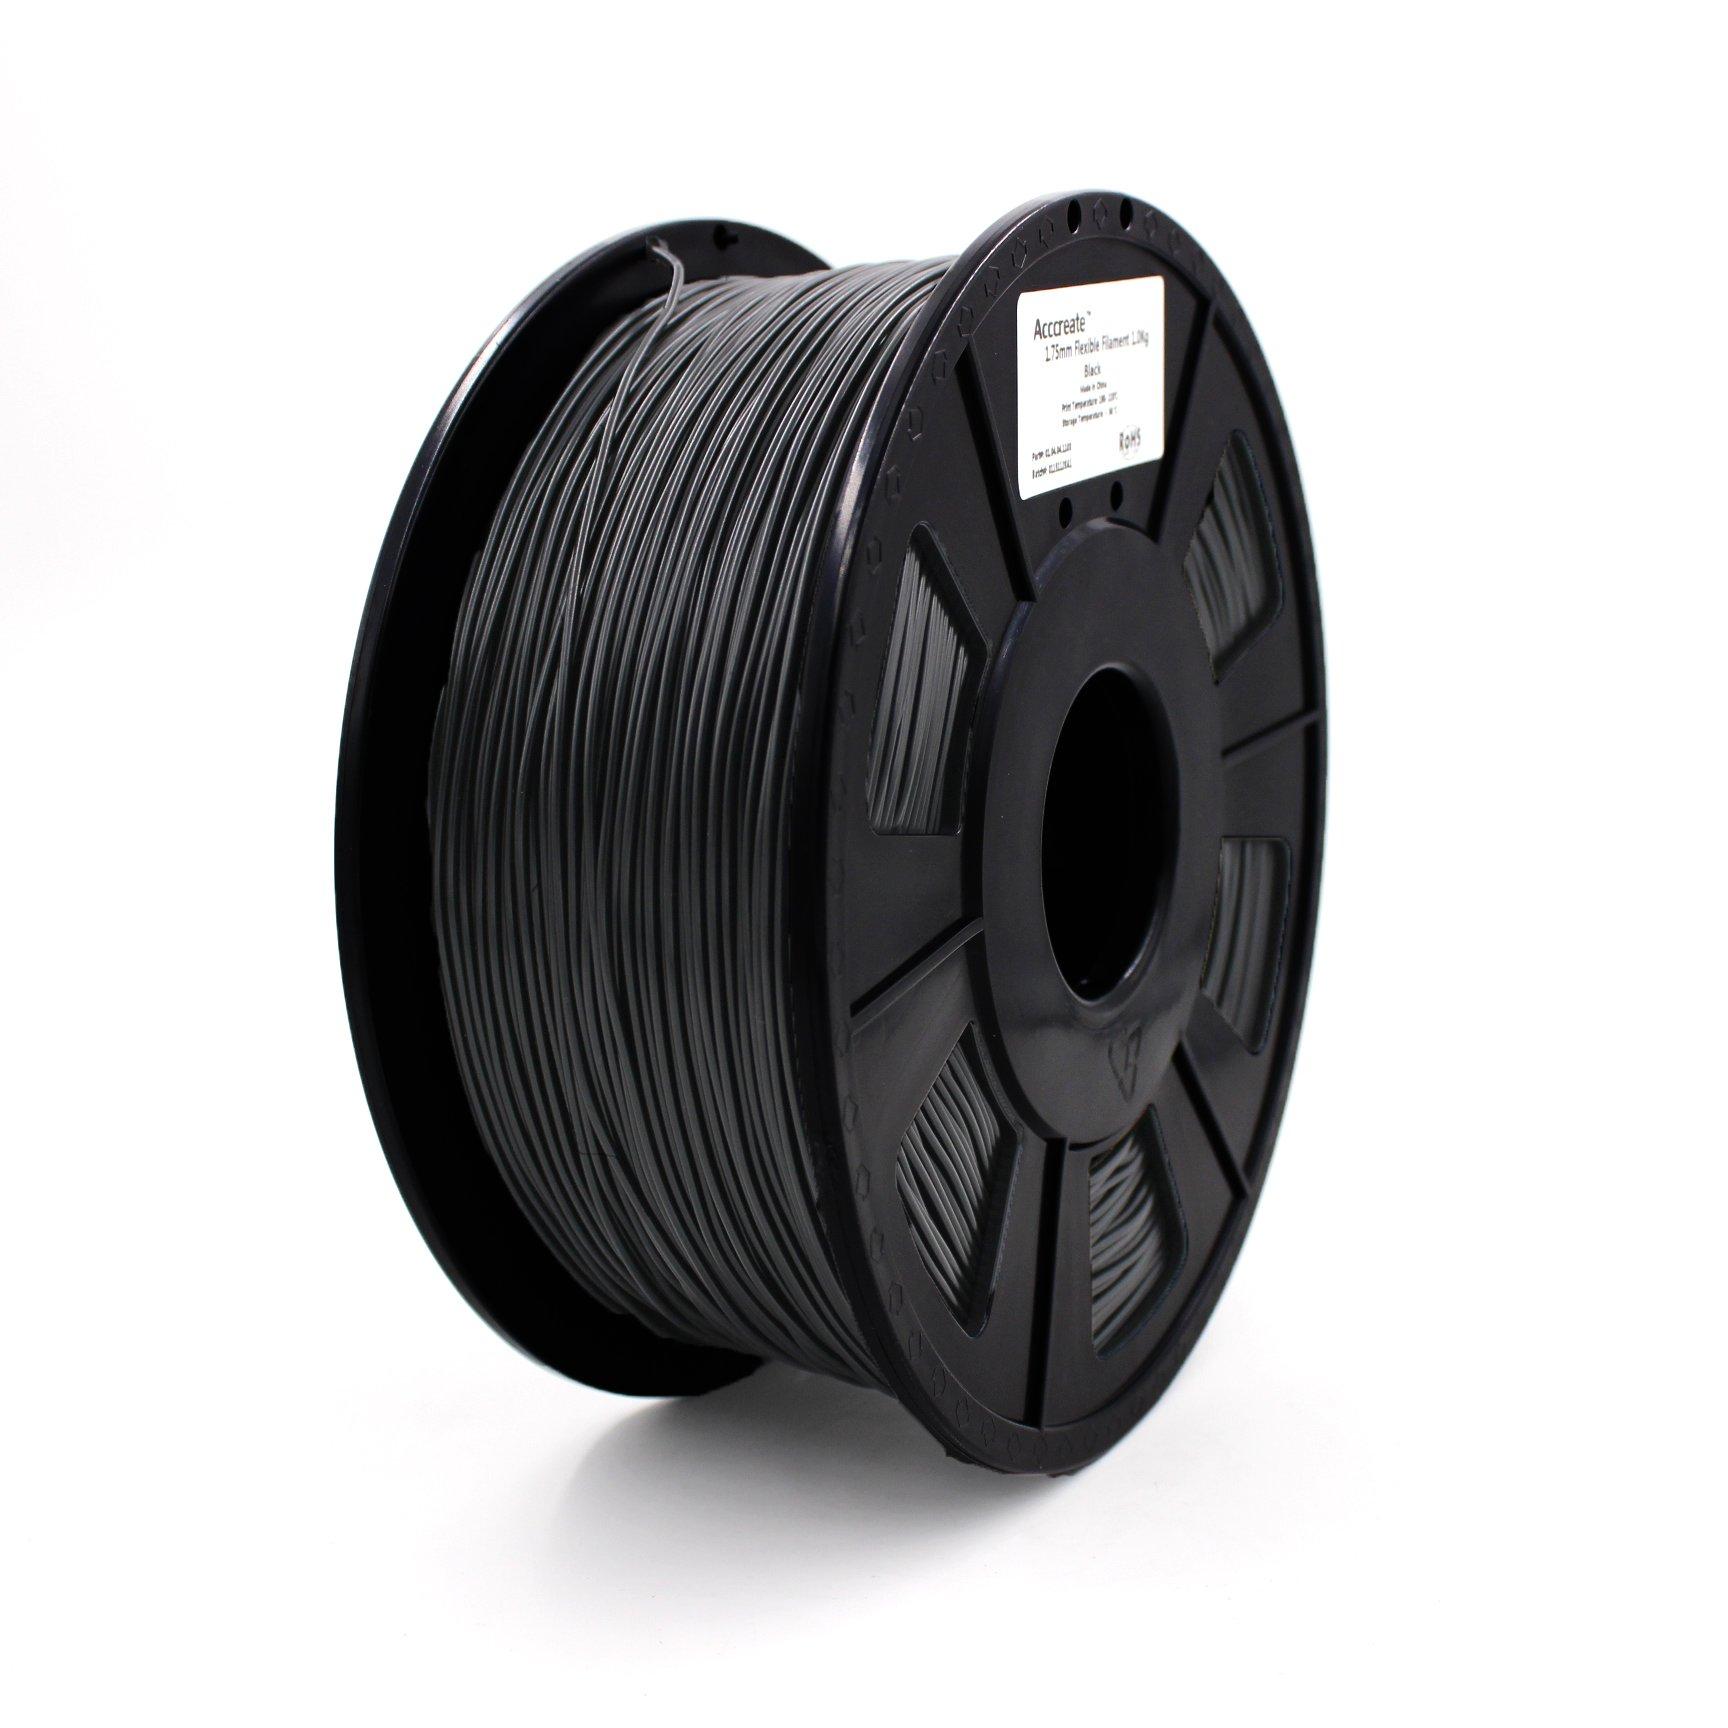 WEISTEK ACCCREATE 1.75mm Flexible PLA 3D Printing Filament, Dimensional Accuracy +/-0.05 mm, 1KG(2.2lbs)